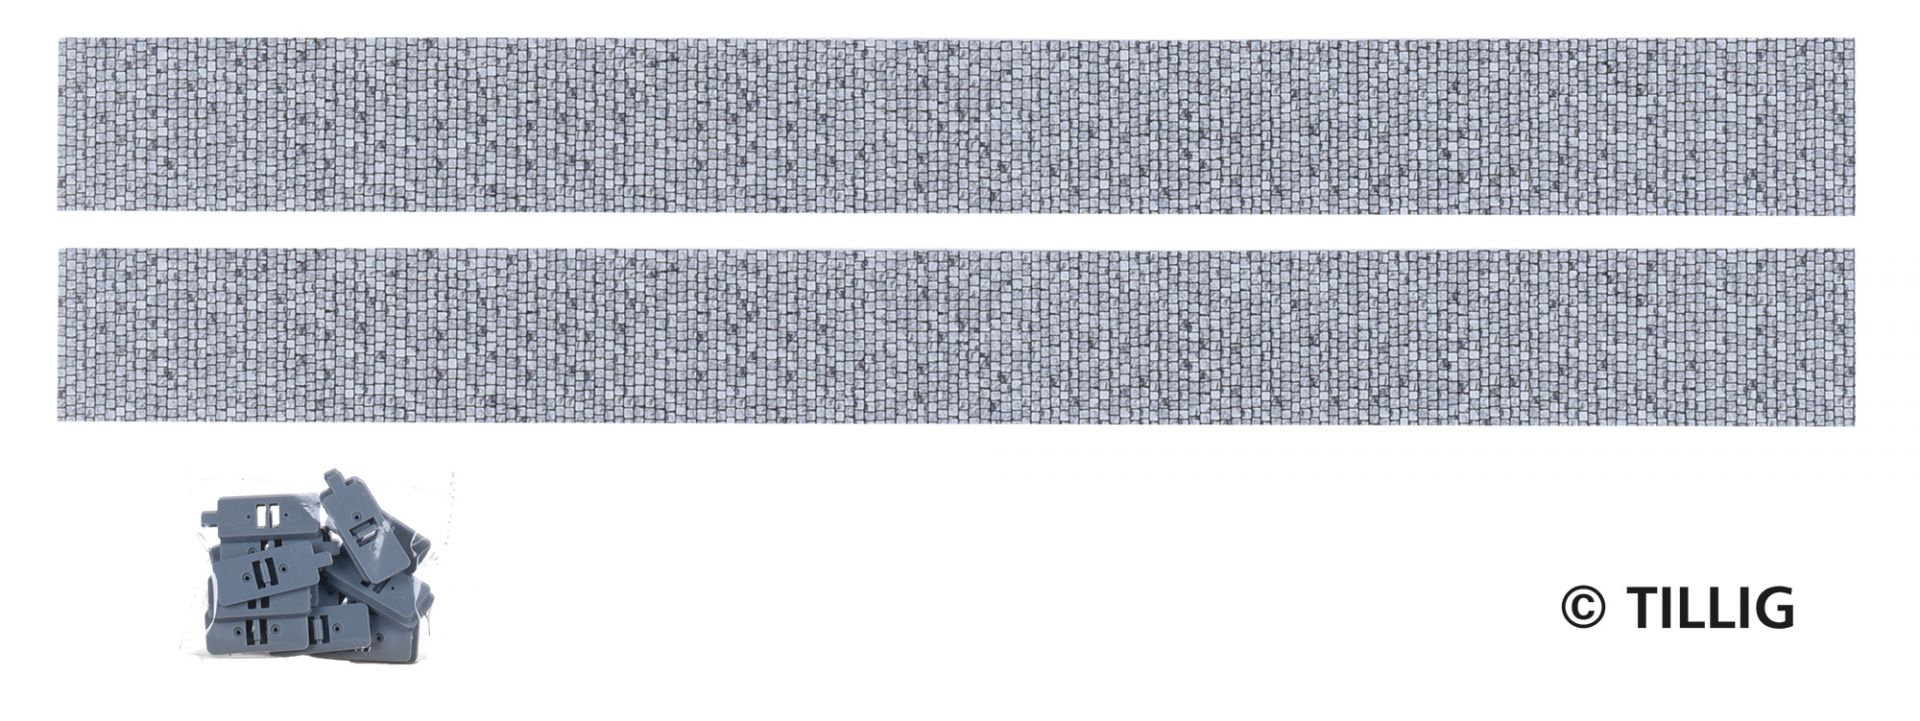 Gerade (2x Parallel) 316,8x32mm Pflaster (TT, H0m)